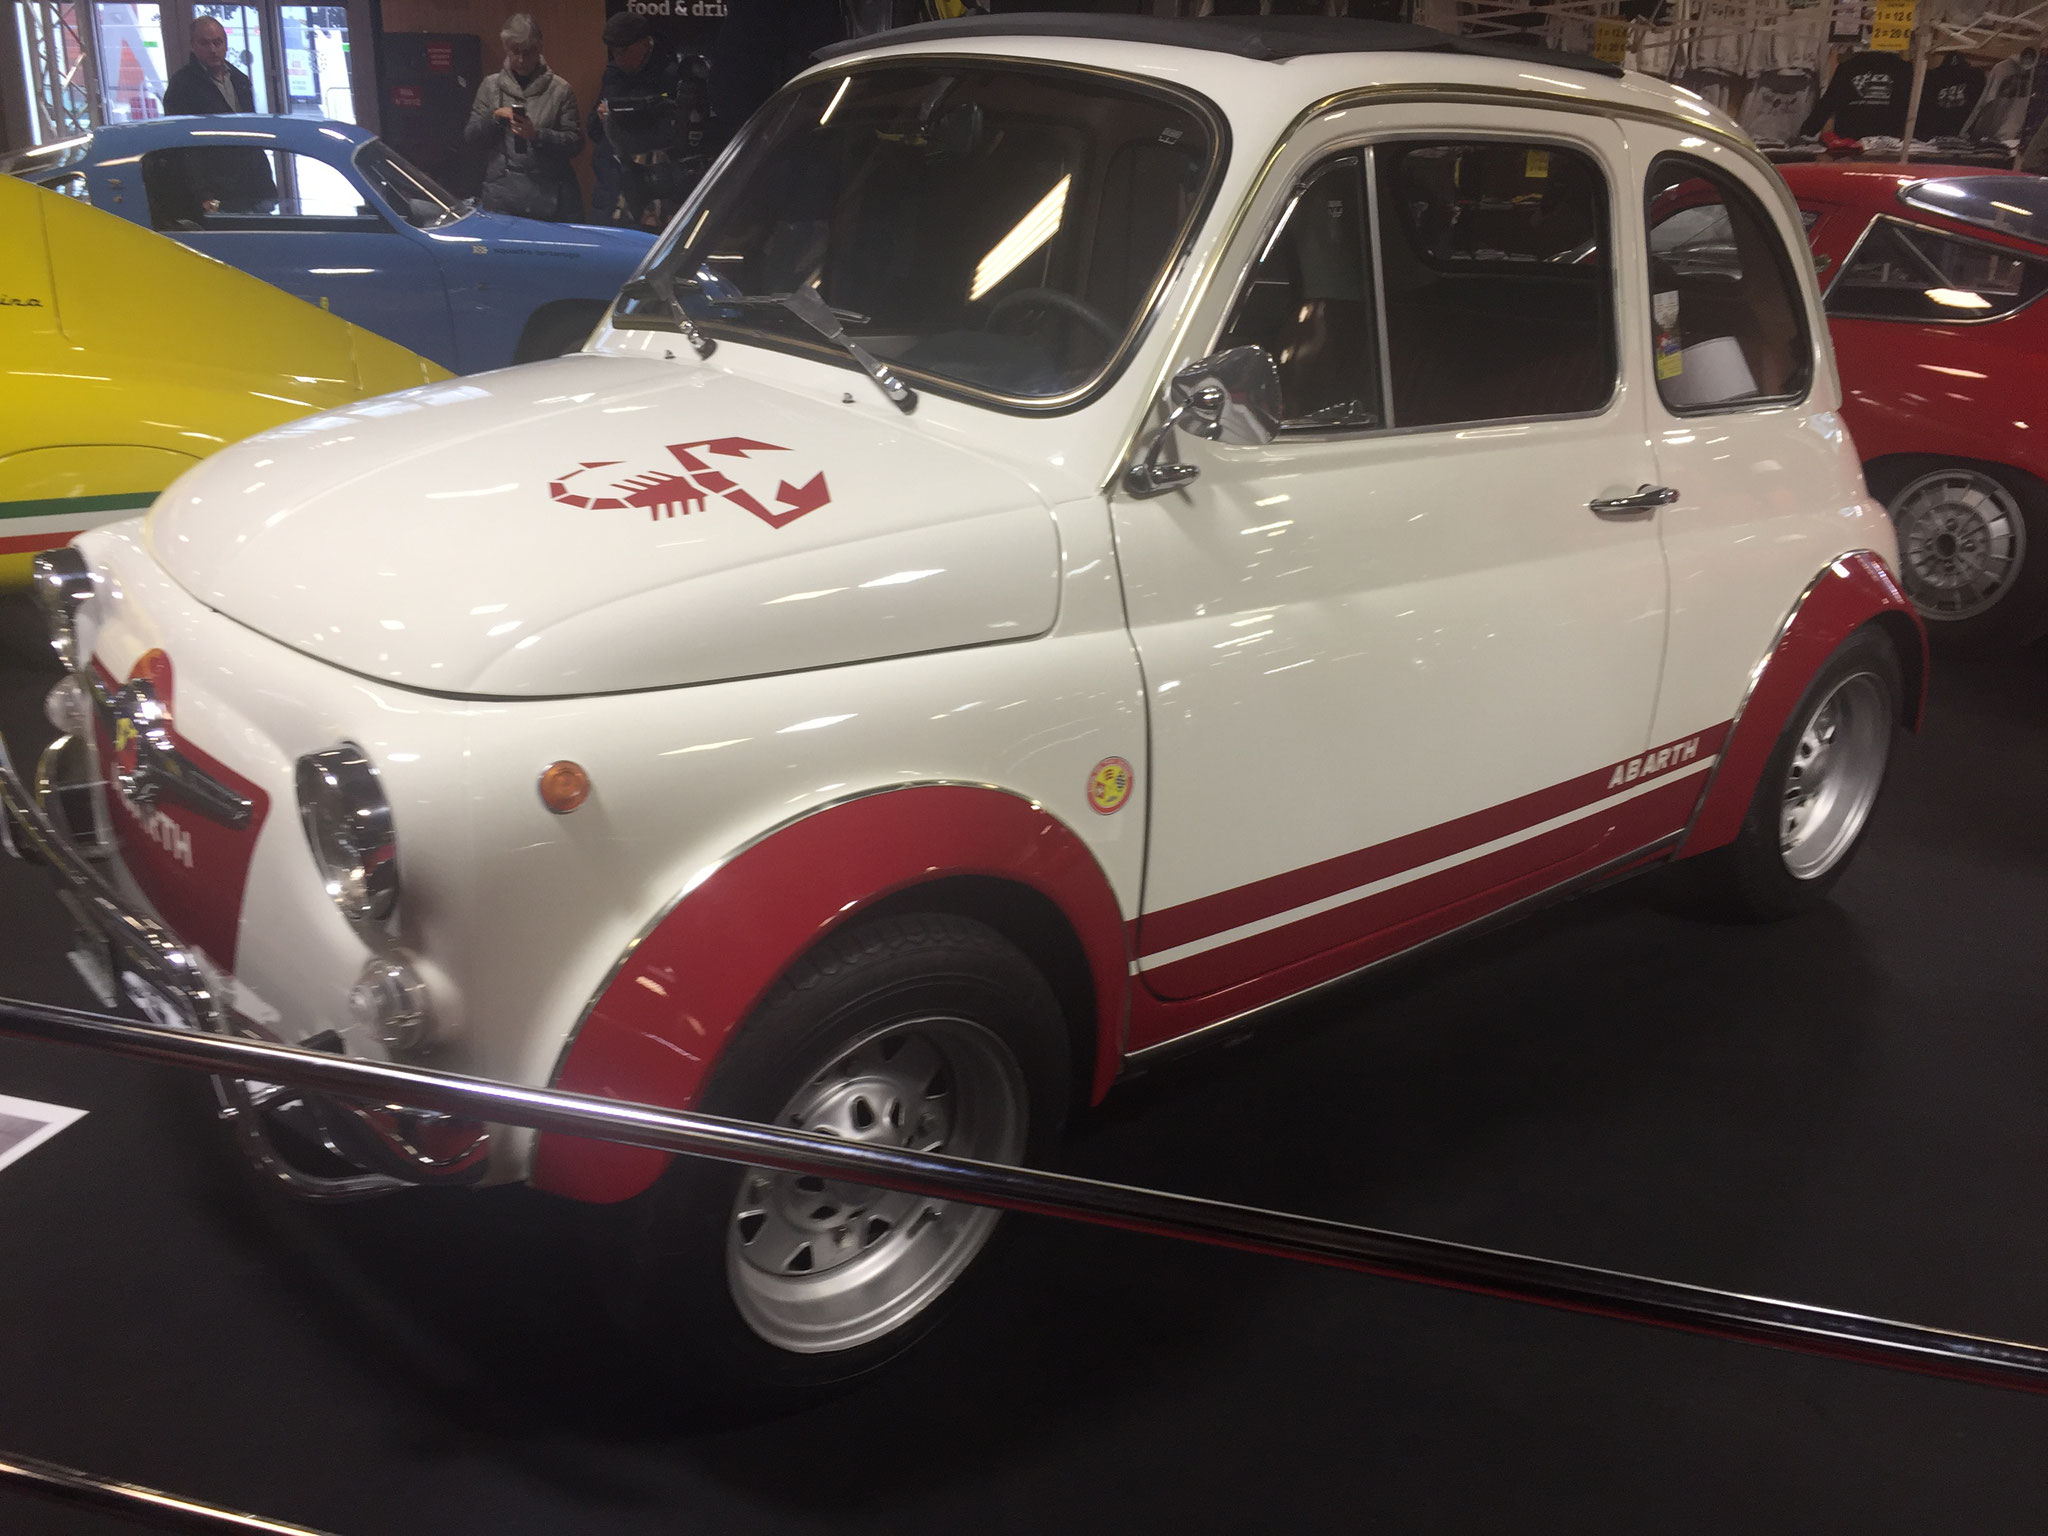 FIAT ABARTH 595 SS (1970)